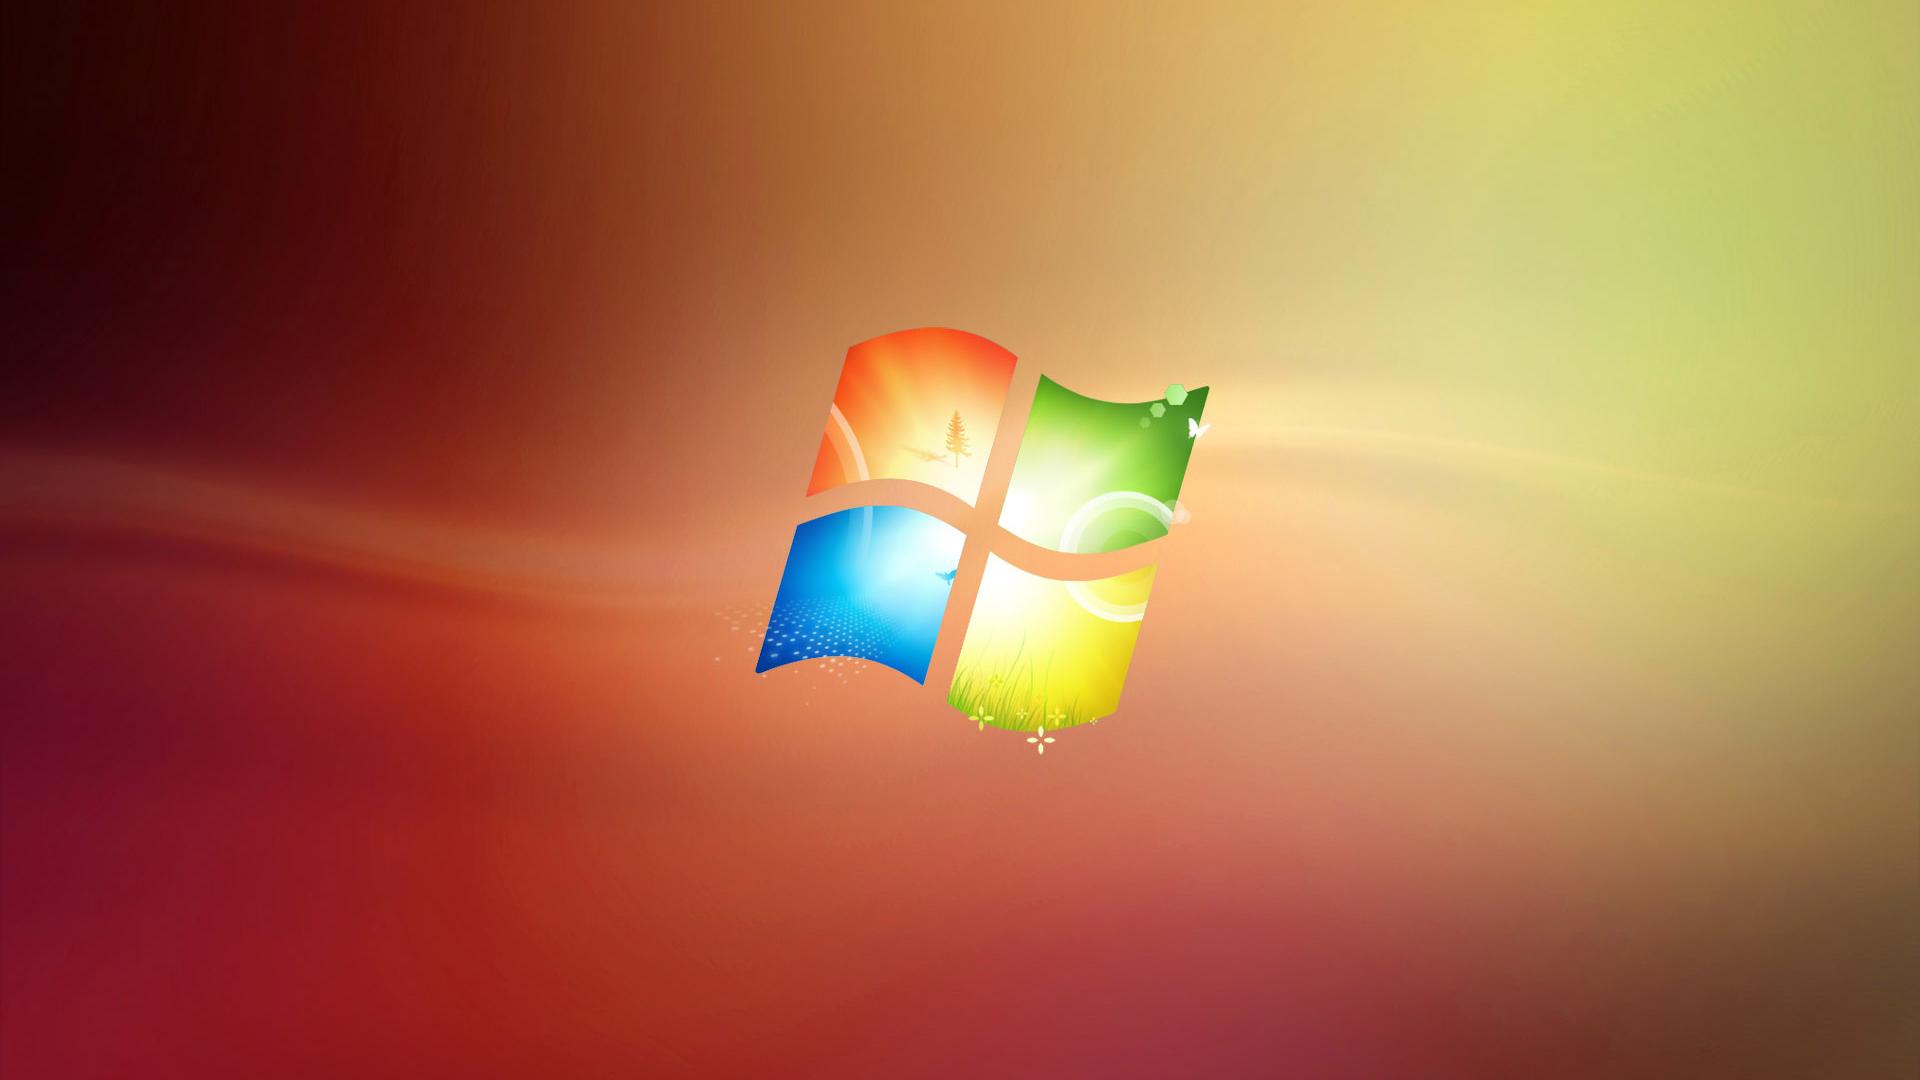 Windows 7 Wallpaper 41272